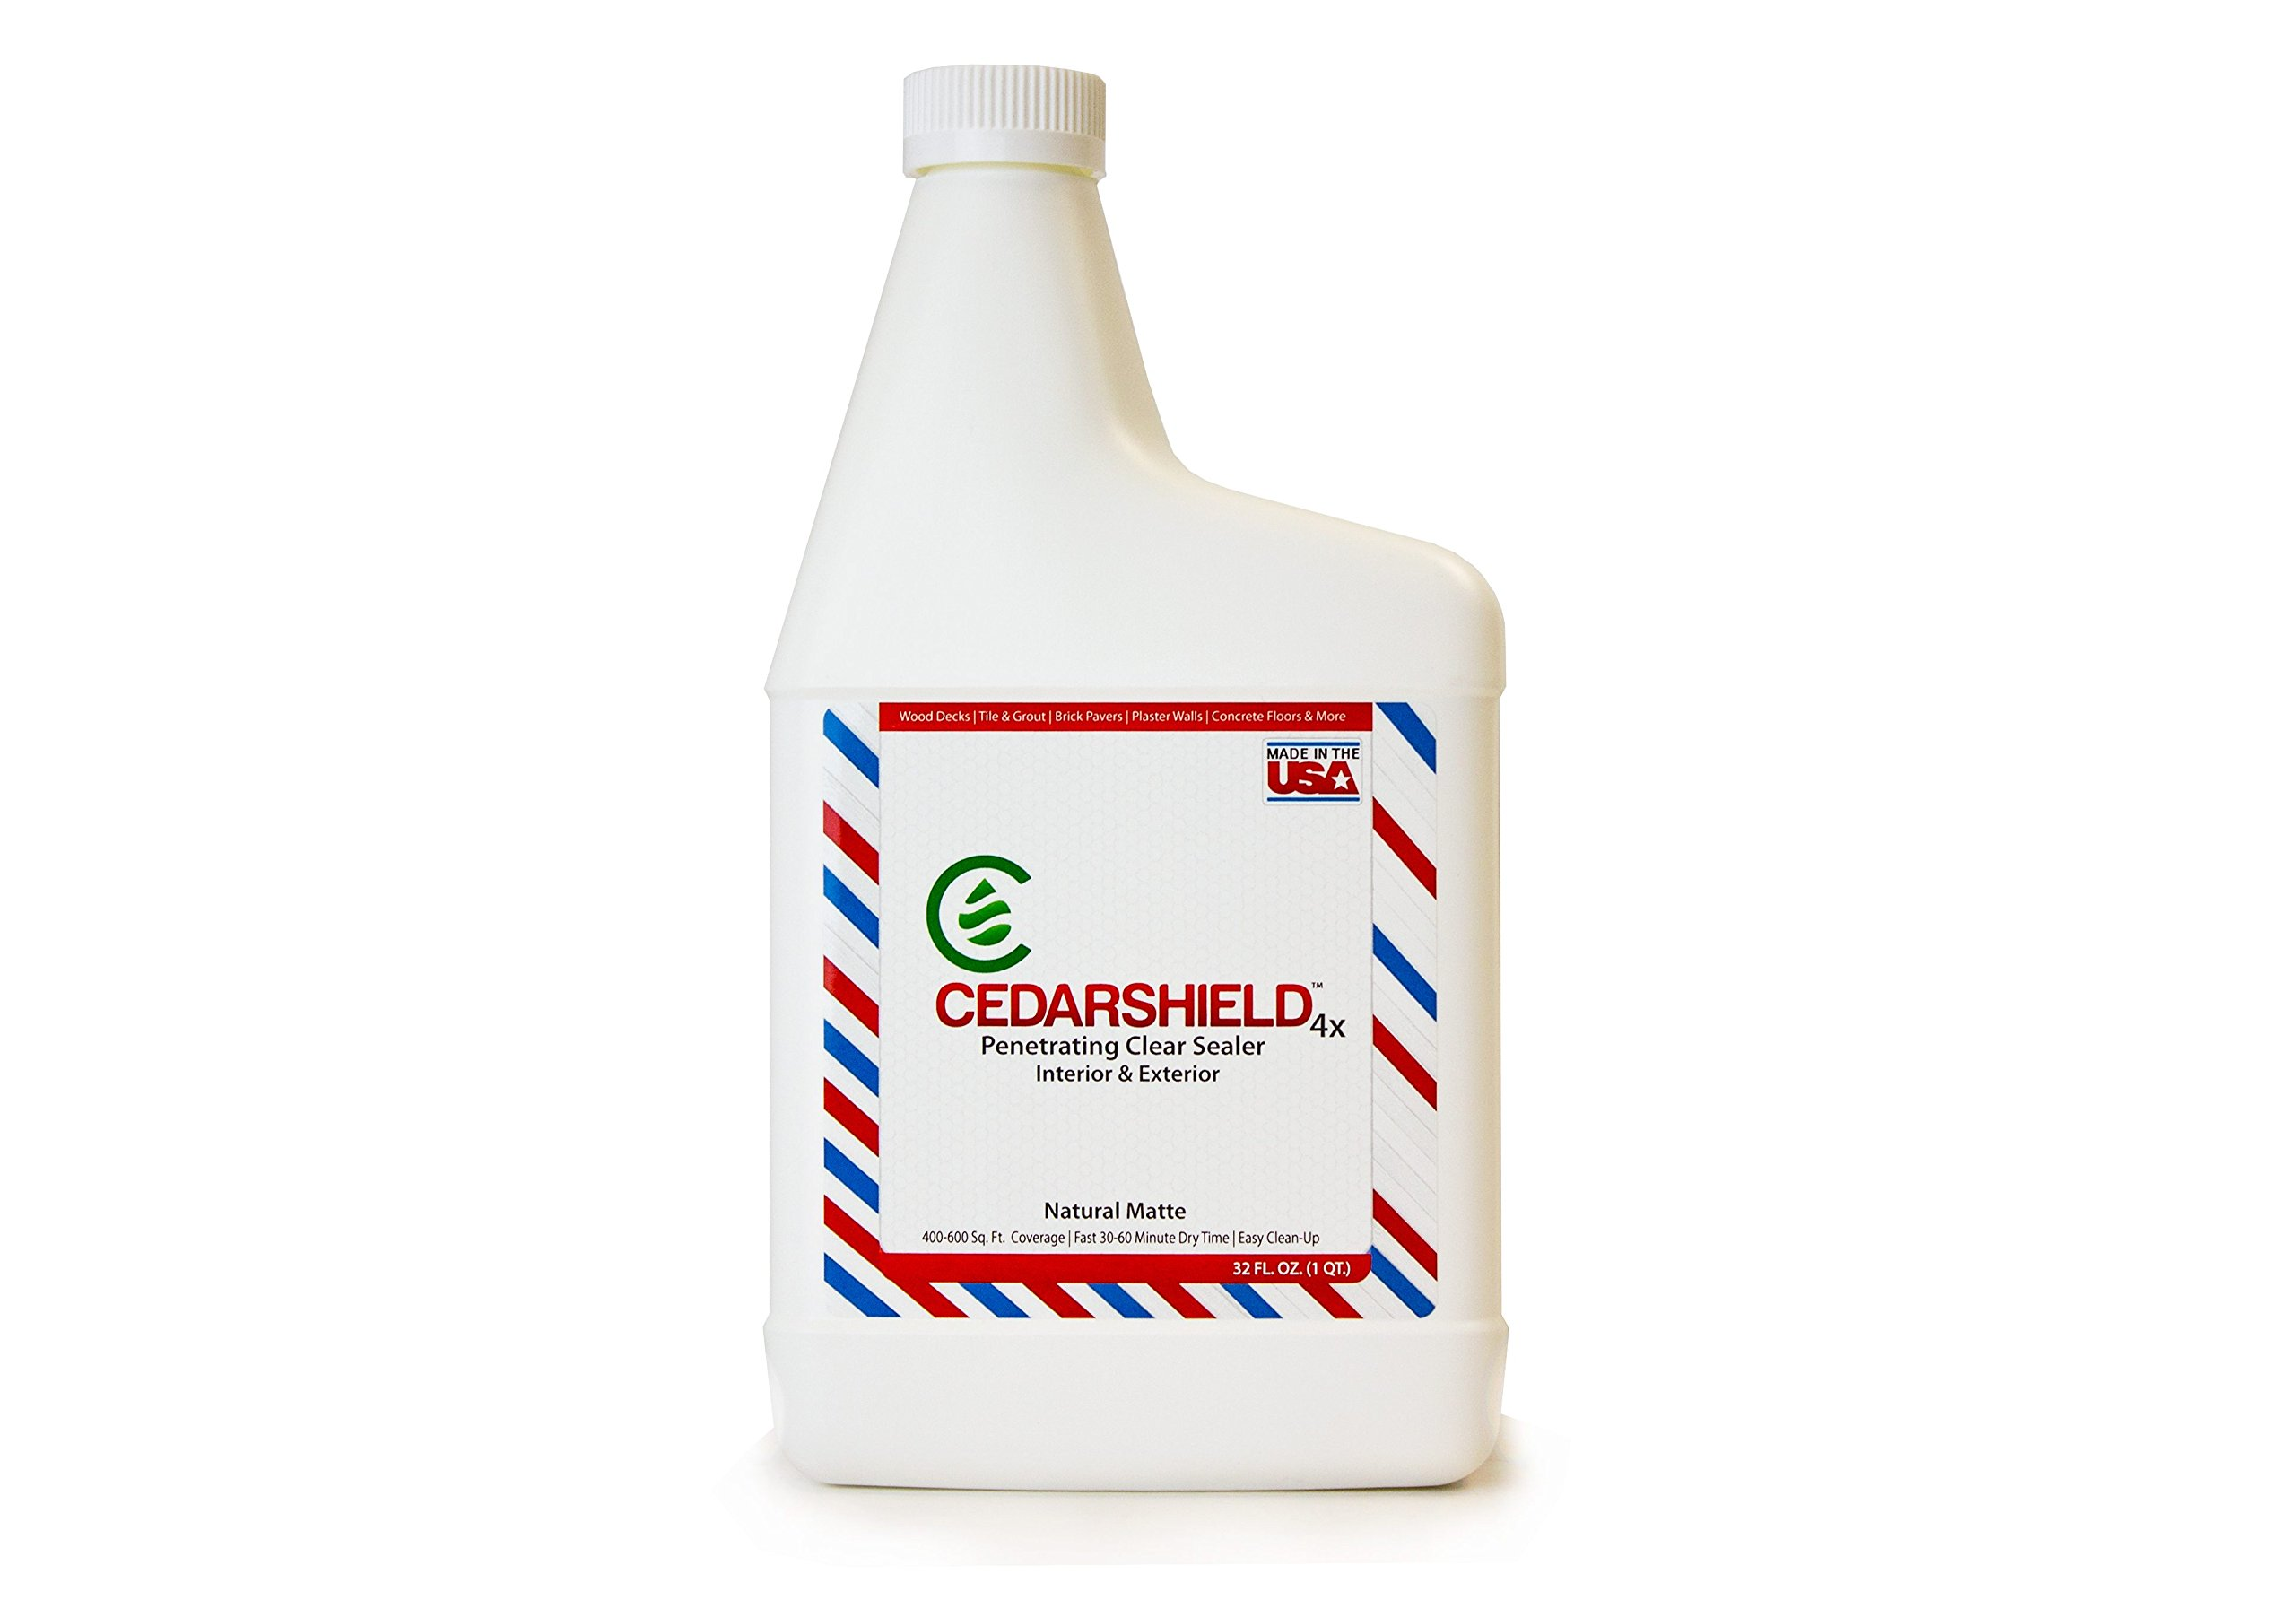 Cedarshield 4X – Penetrating Clear Sealer – Interior + Exterior – Natural Matte (Quart)